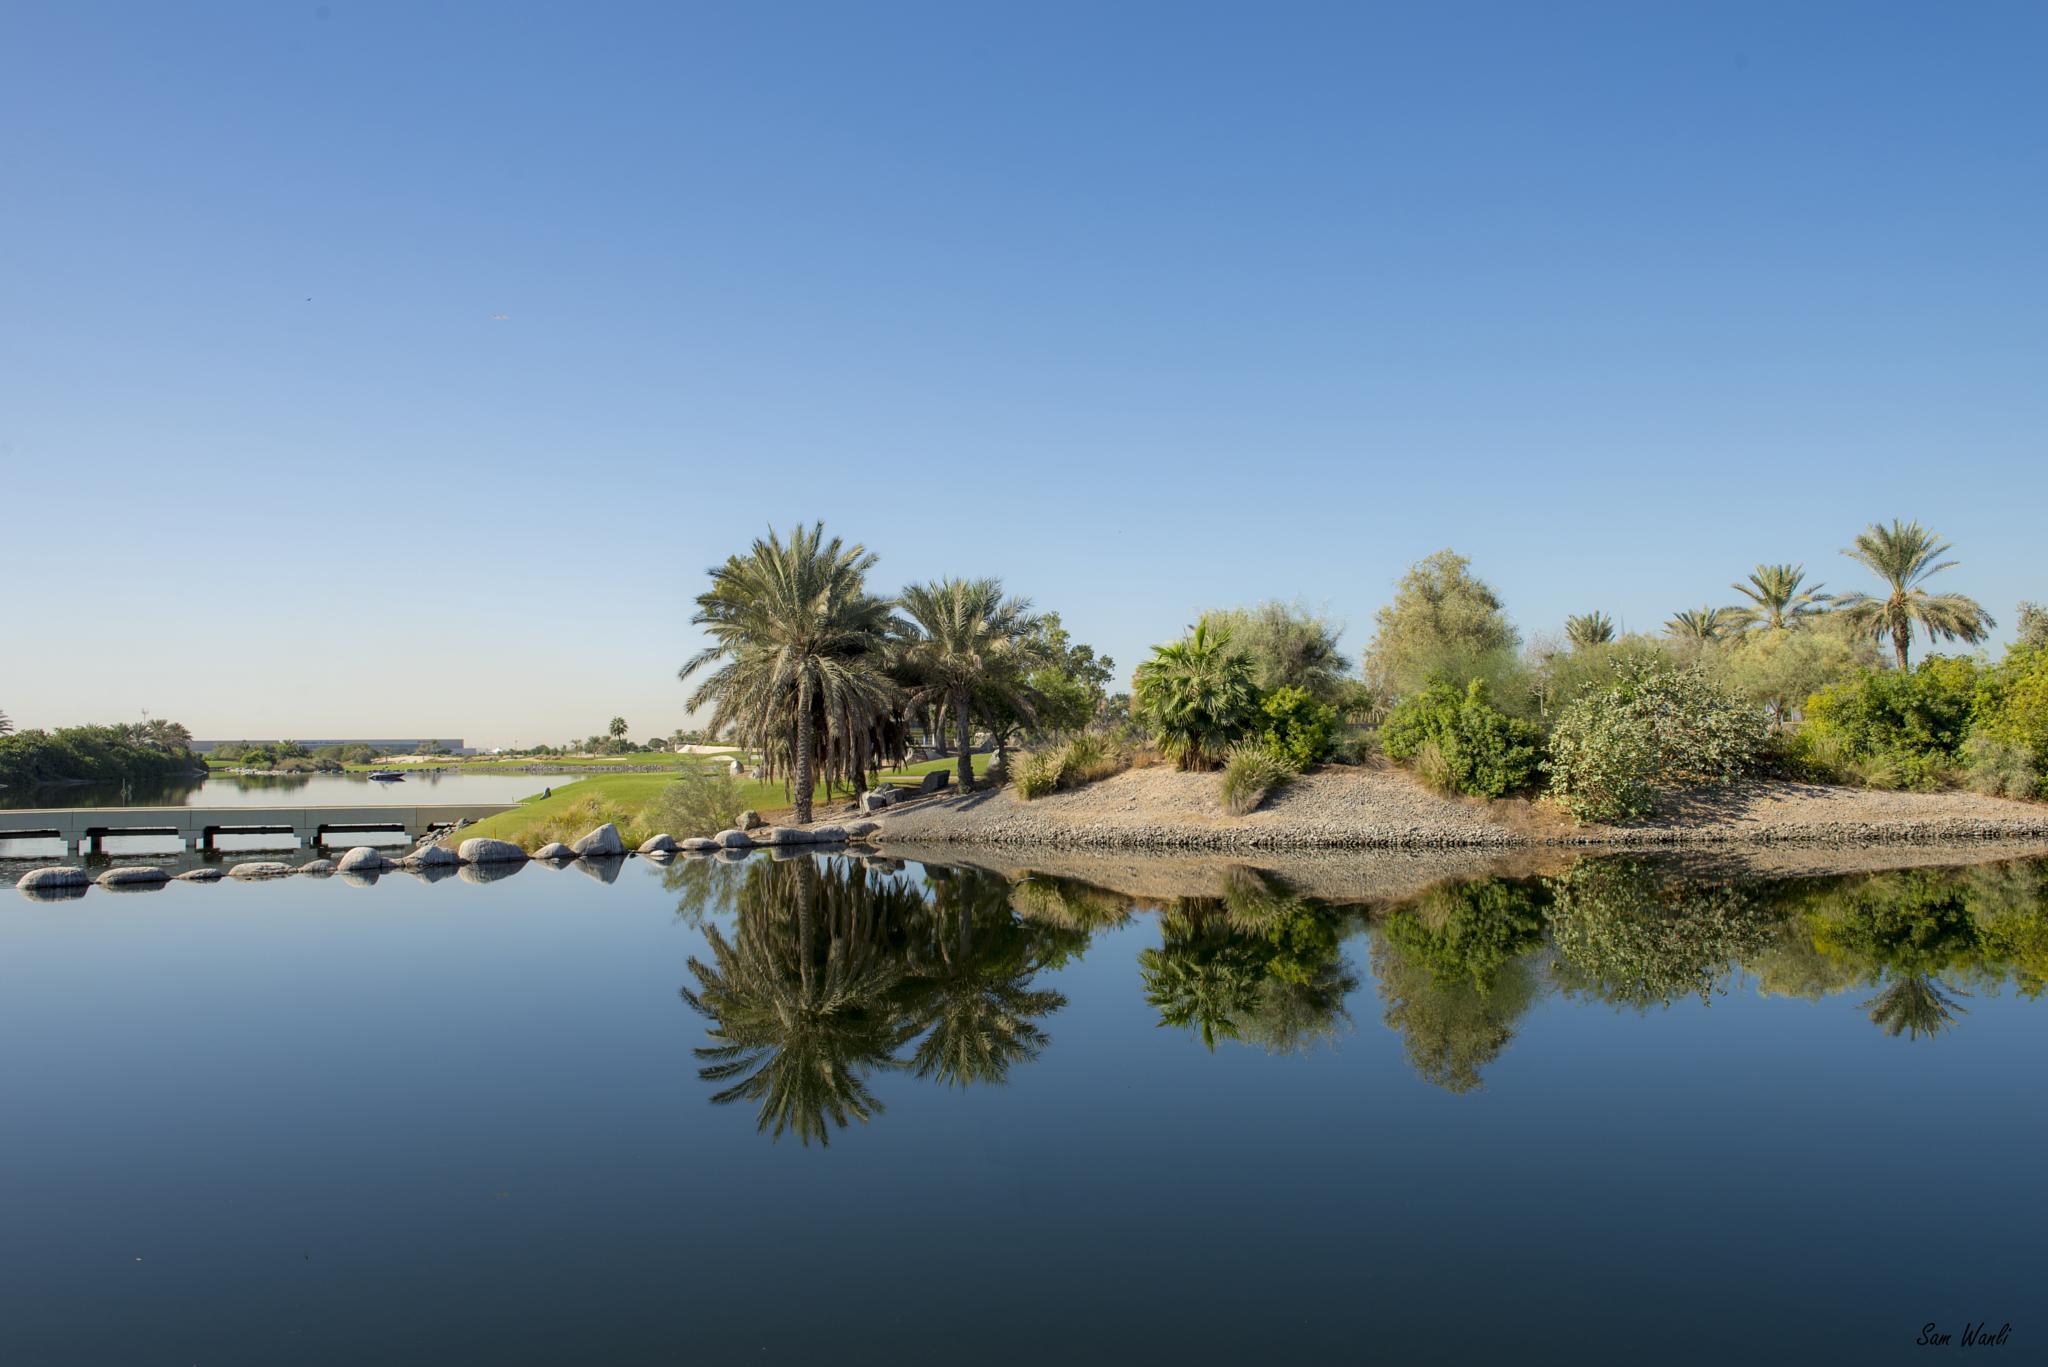 Reflection by Sam Wanli